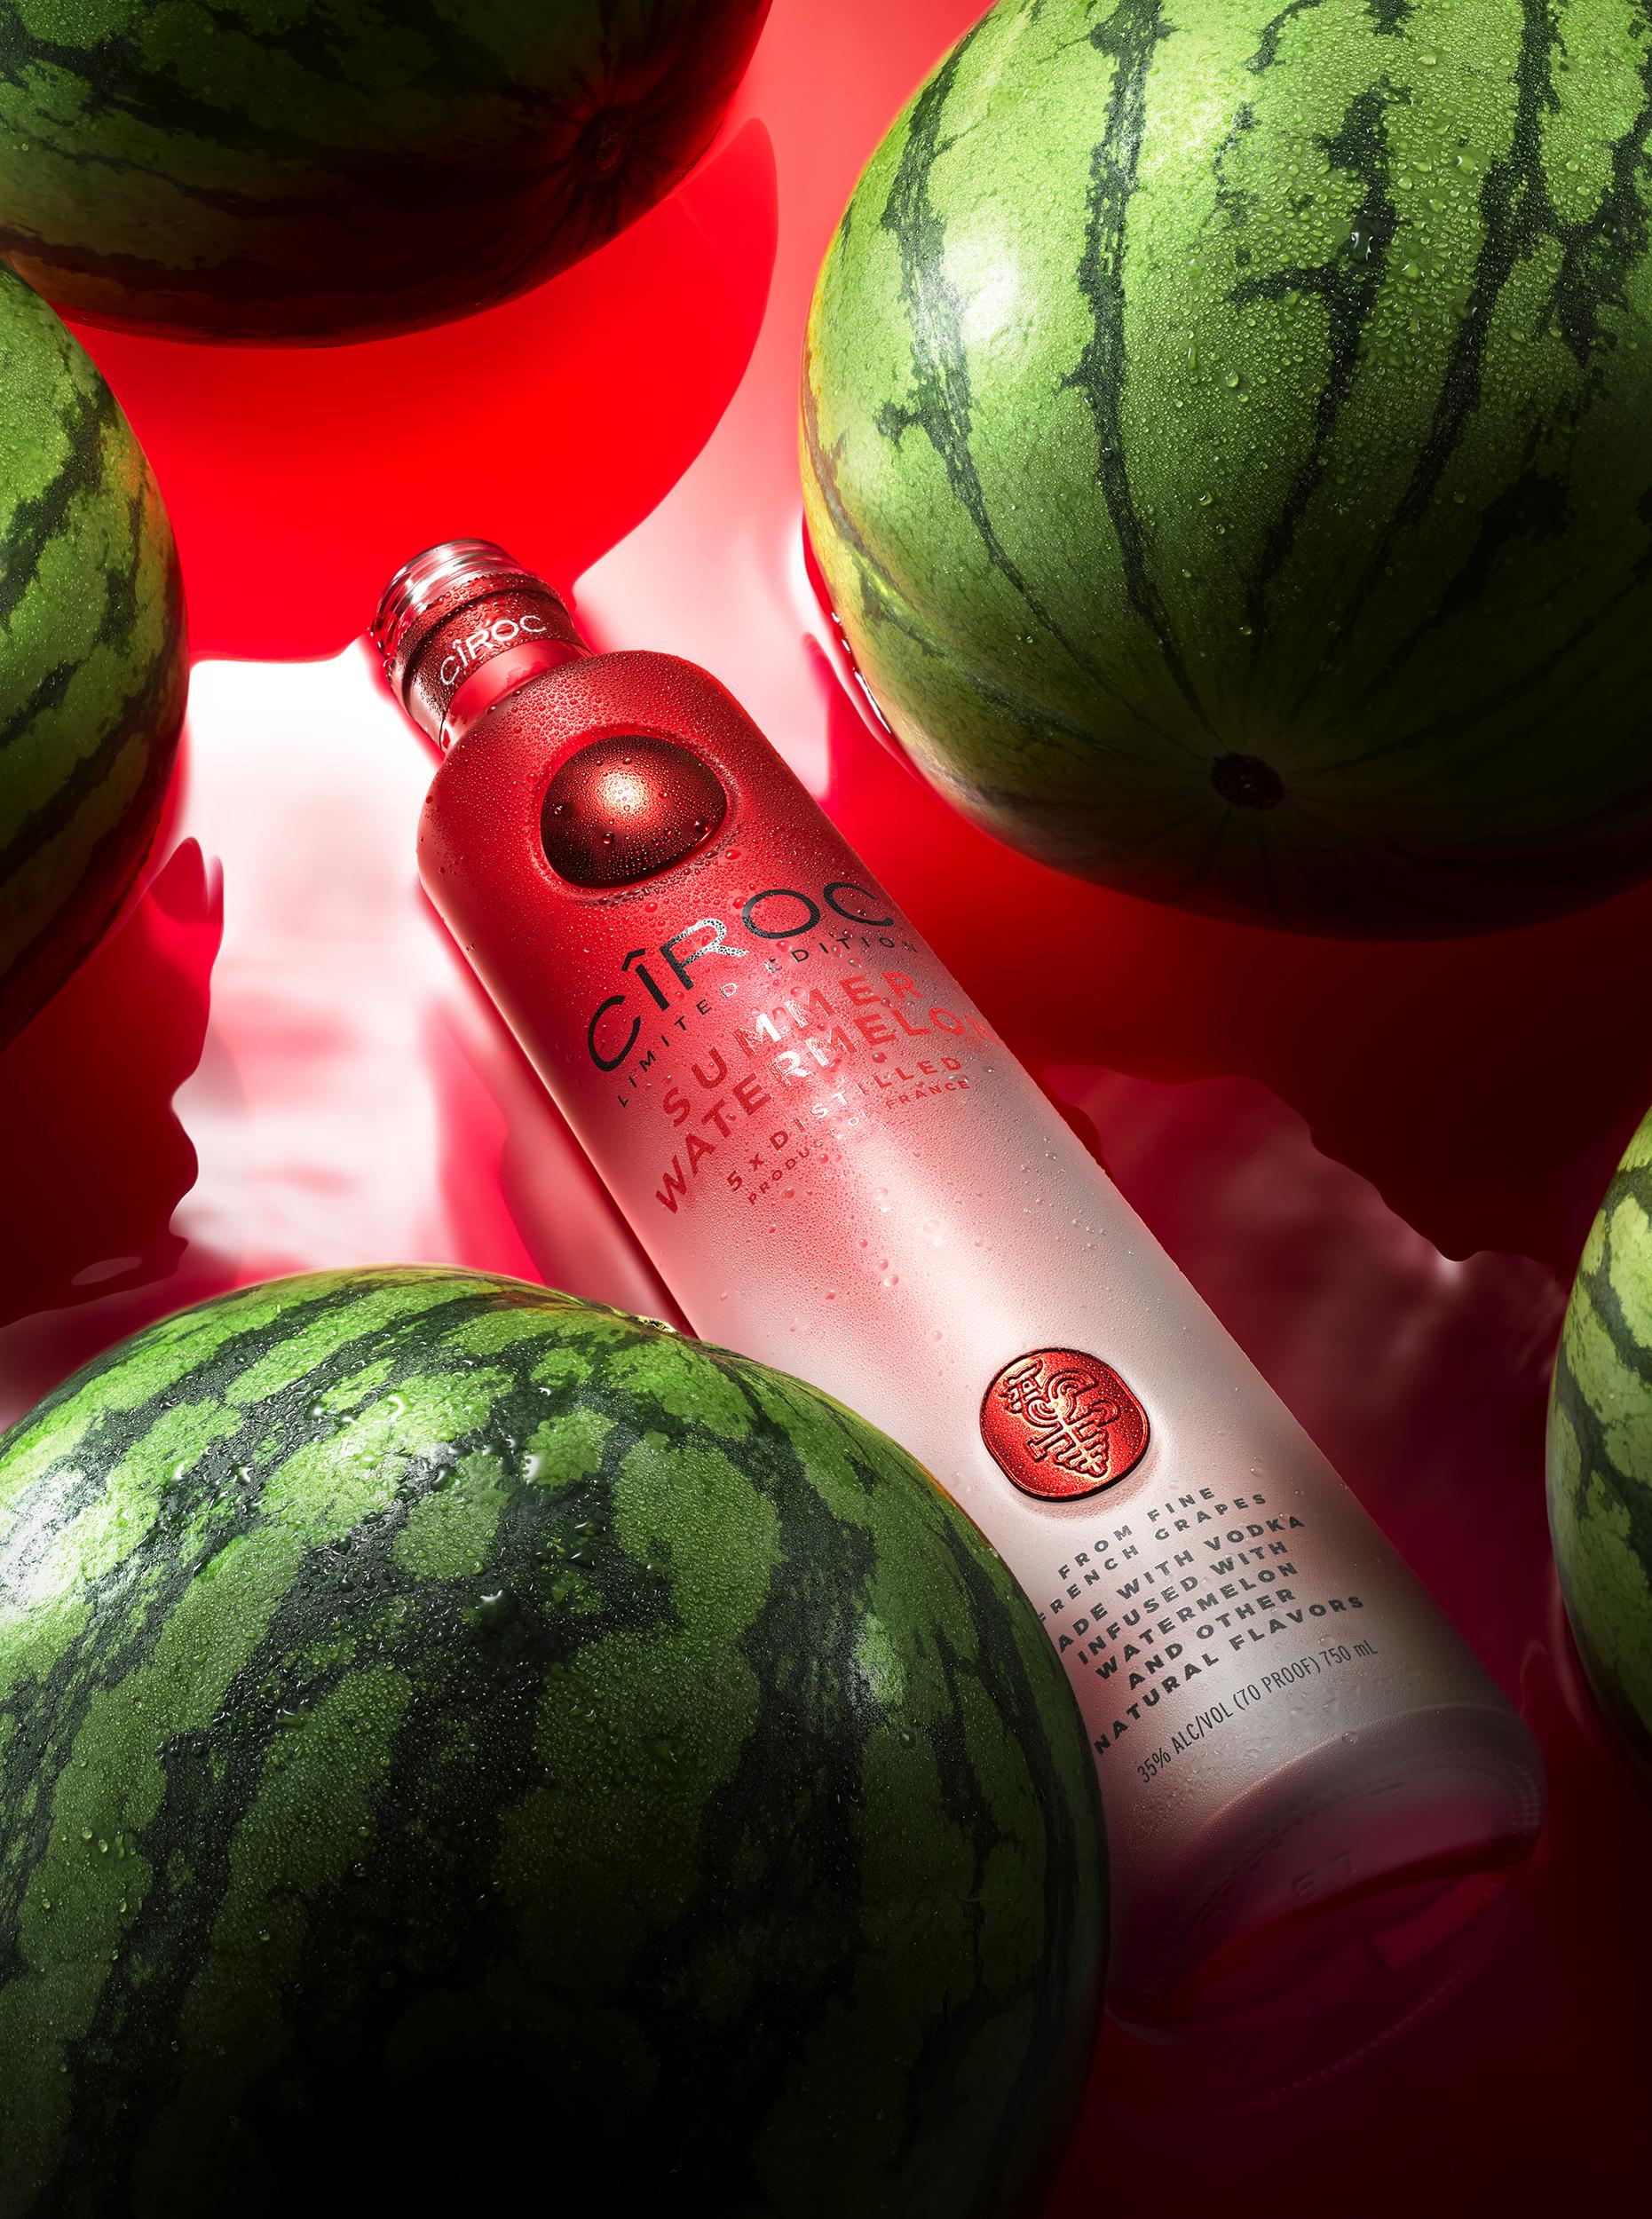 Ciroc_Watermelon.jpg